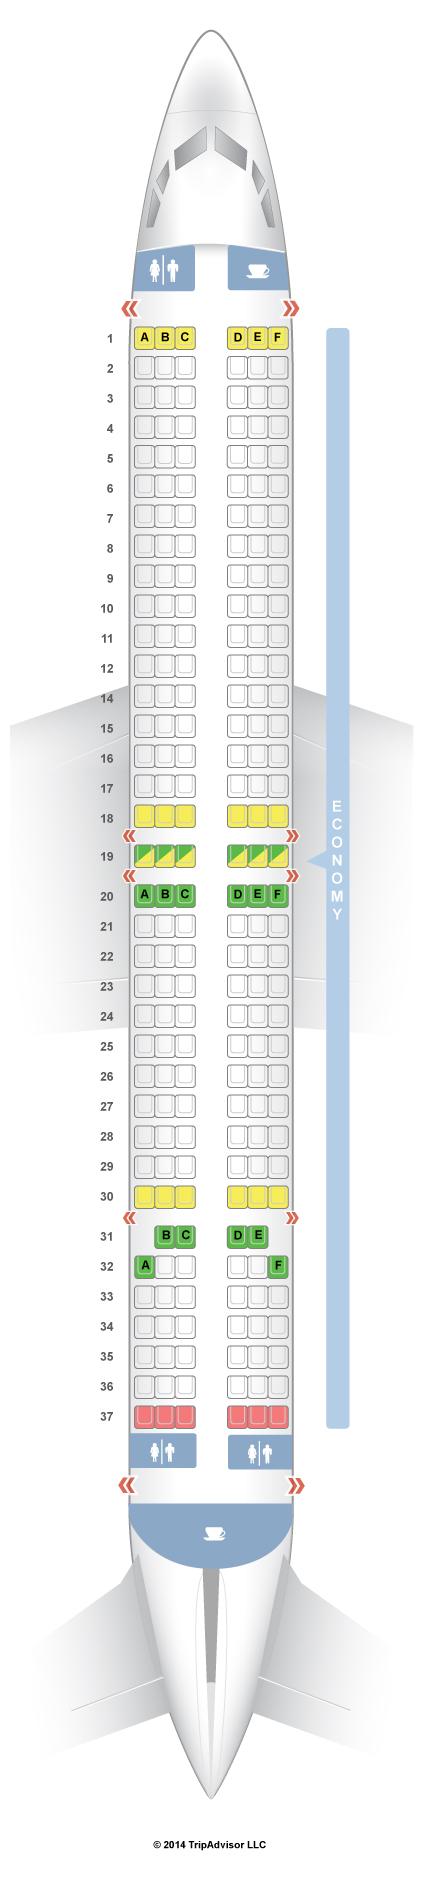 Seatguru Seat Map Lion Airlines Seatguru